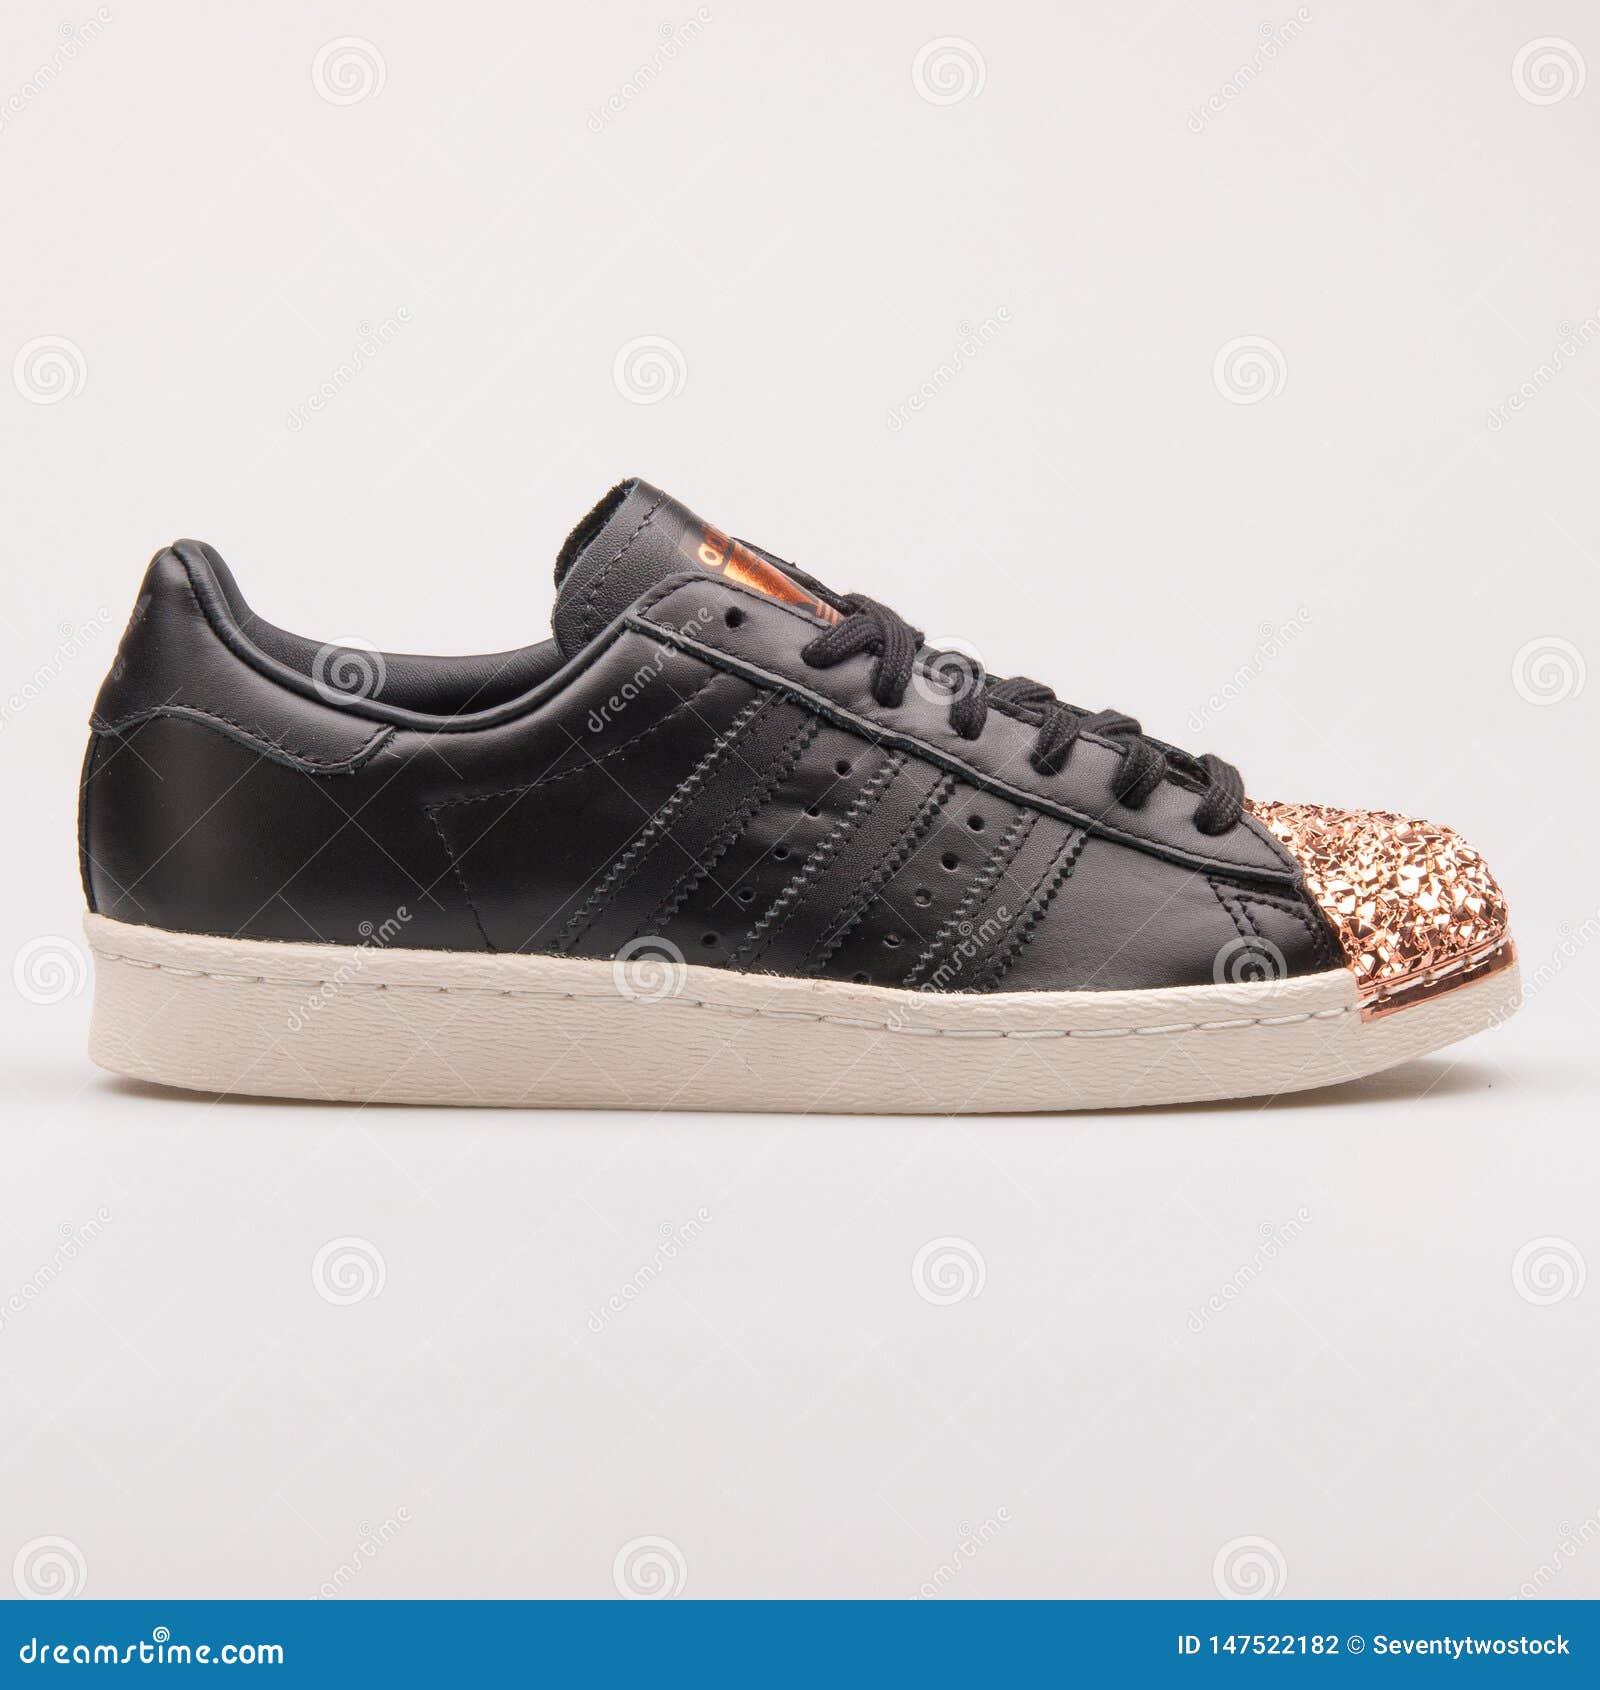 adidas superstar black copper